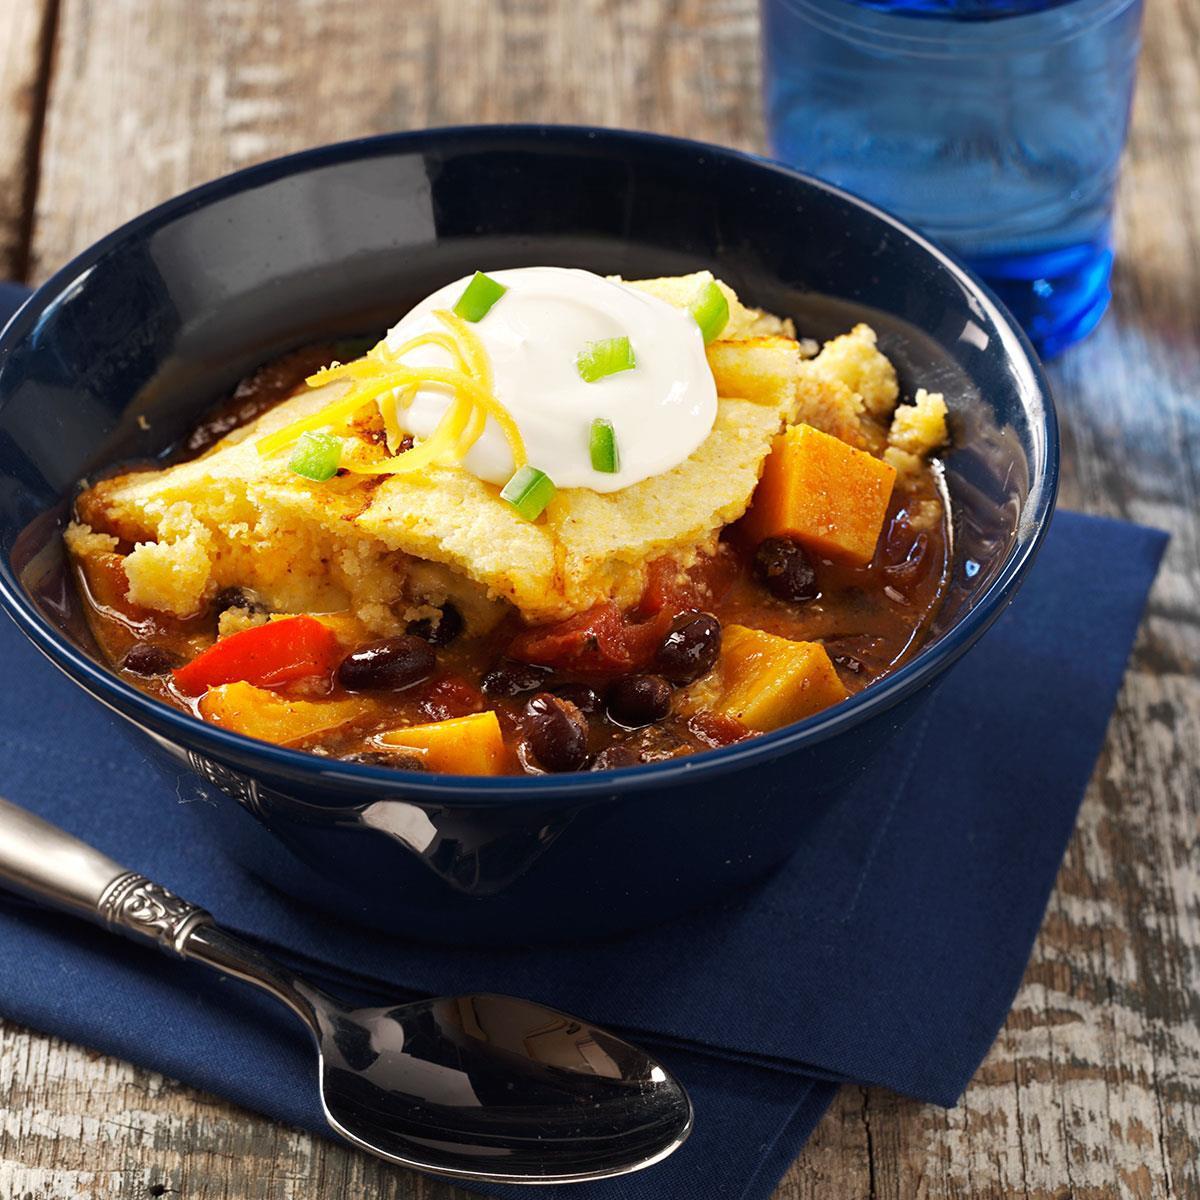 Taste Of Home Vegetarian Chili  Sweet Potato Chili Bake Recipe